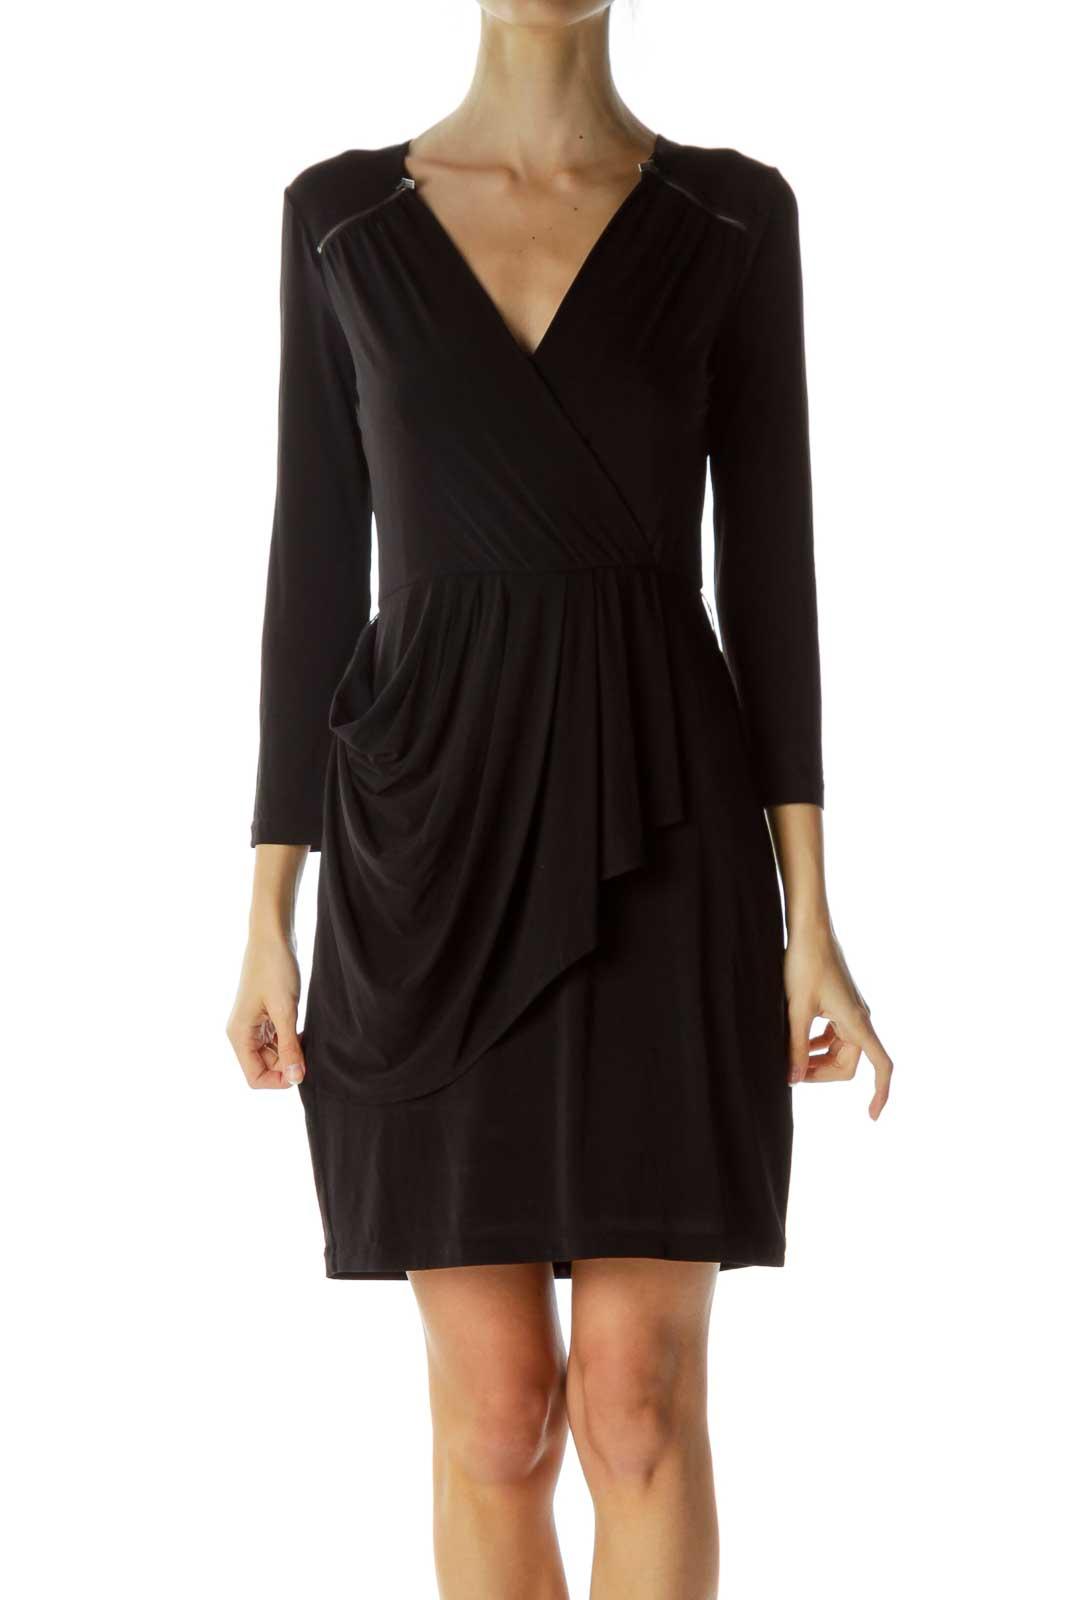 Black Shoulder Zippers Work Dress